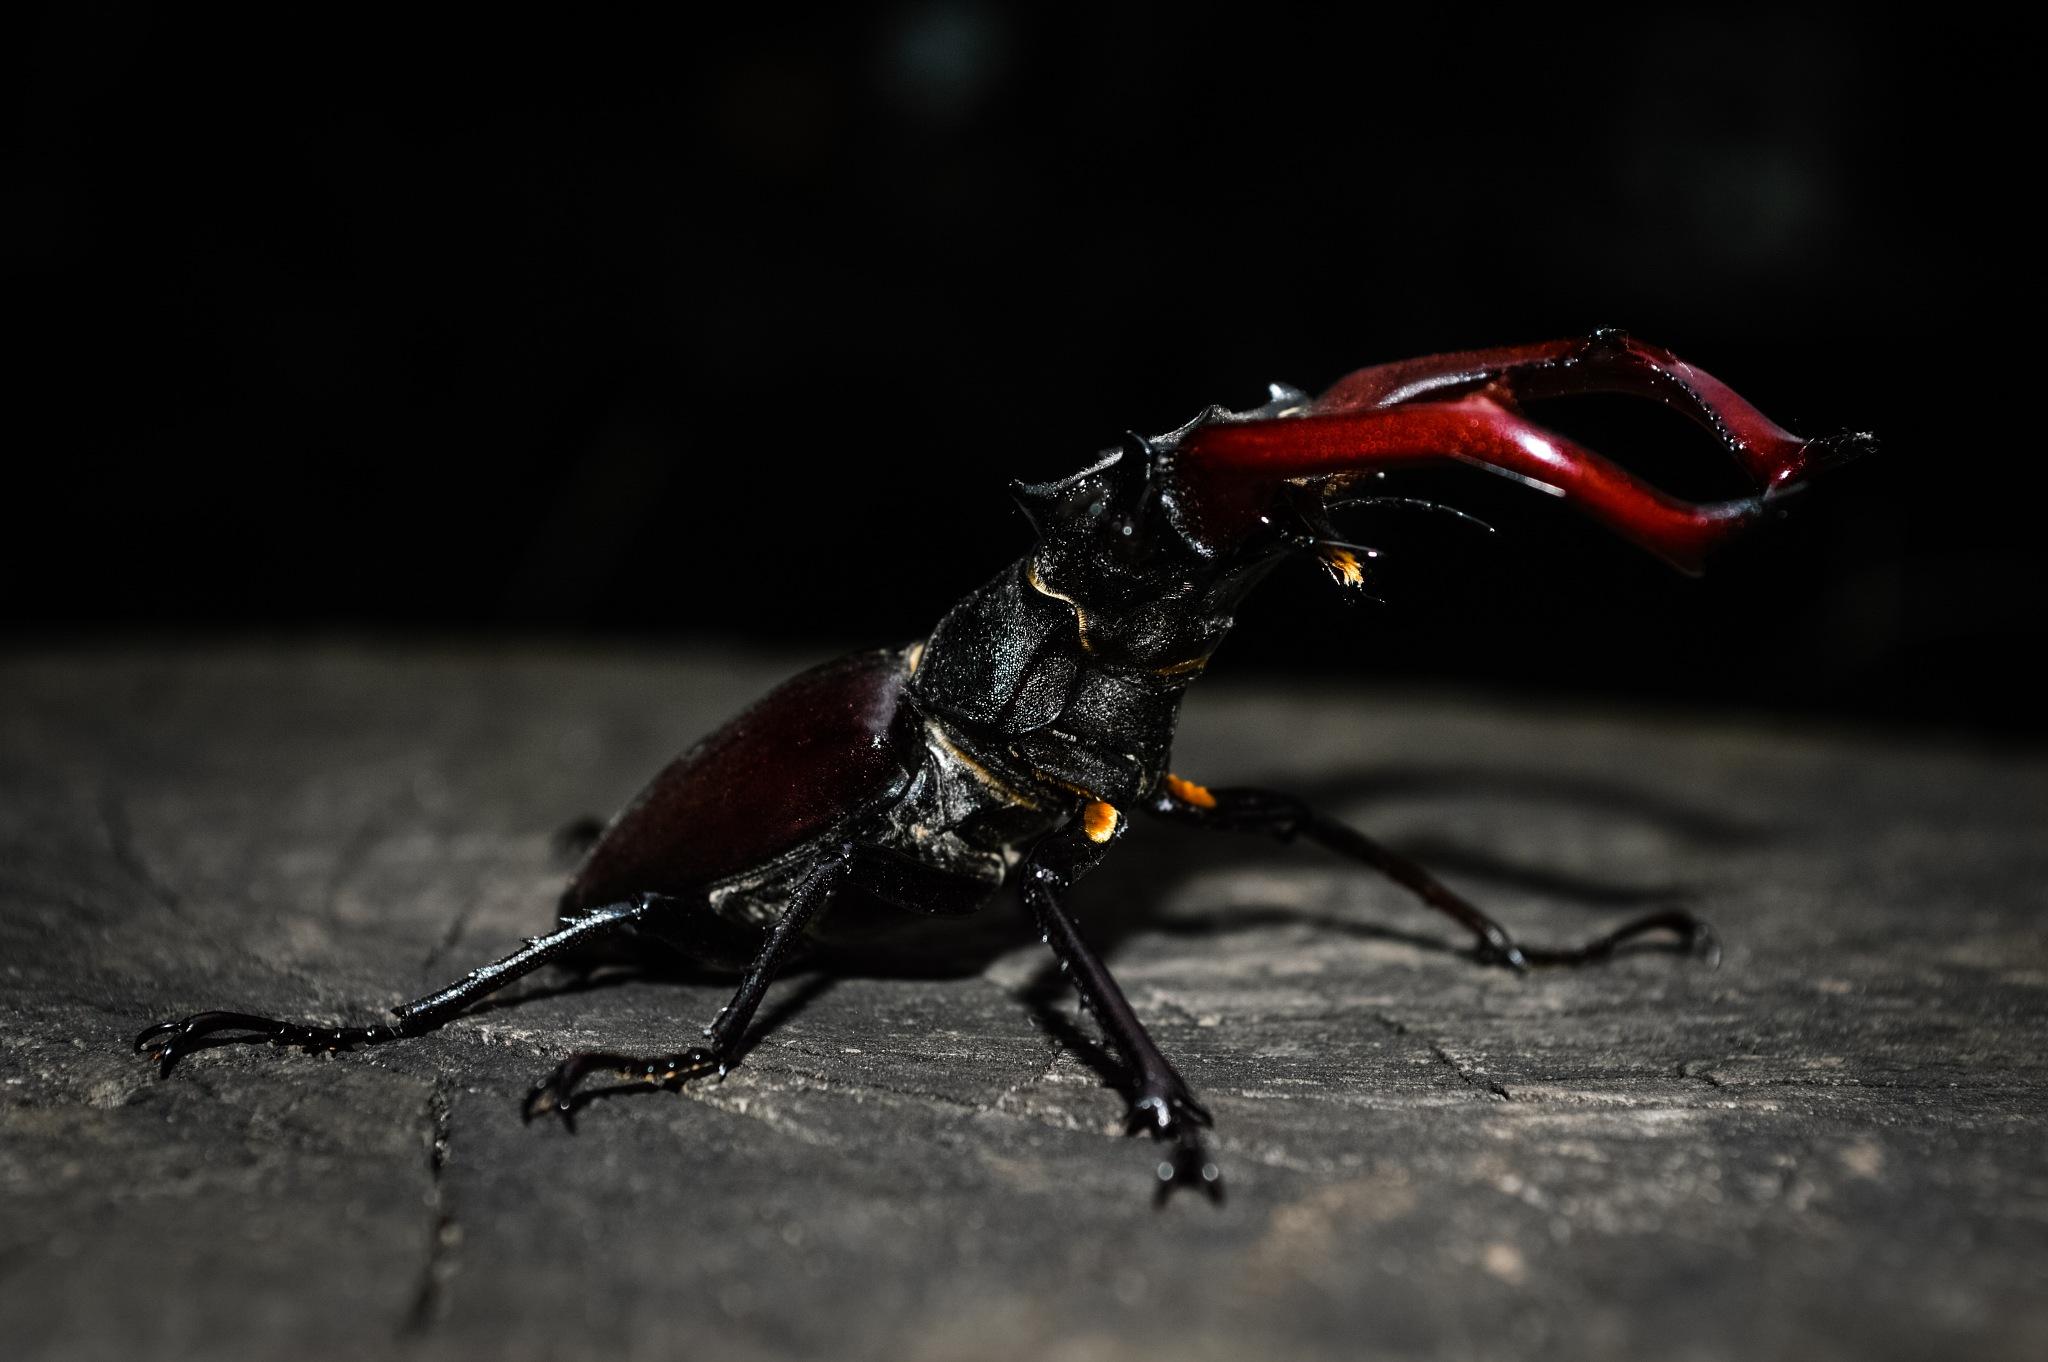 Stag beetle by Iulian Bud